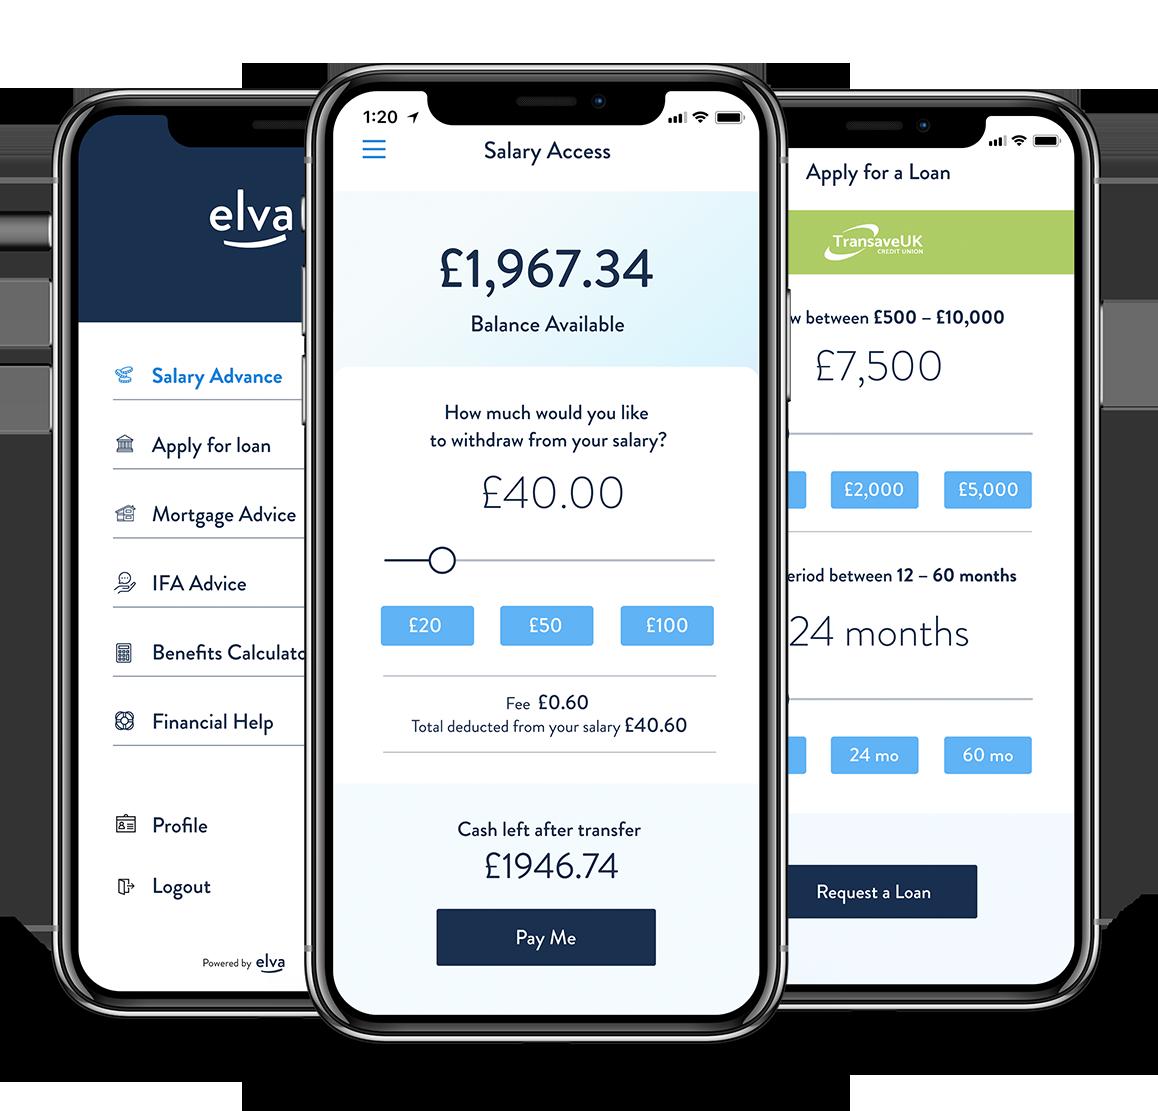 Three Elva Financial Wellbeing Phone Screens